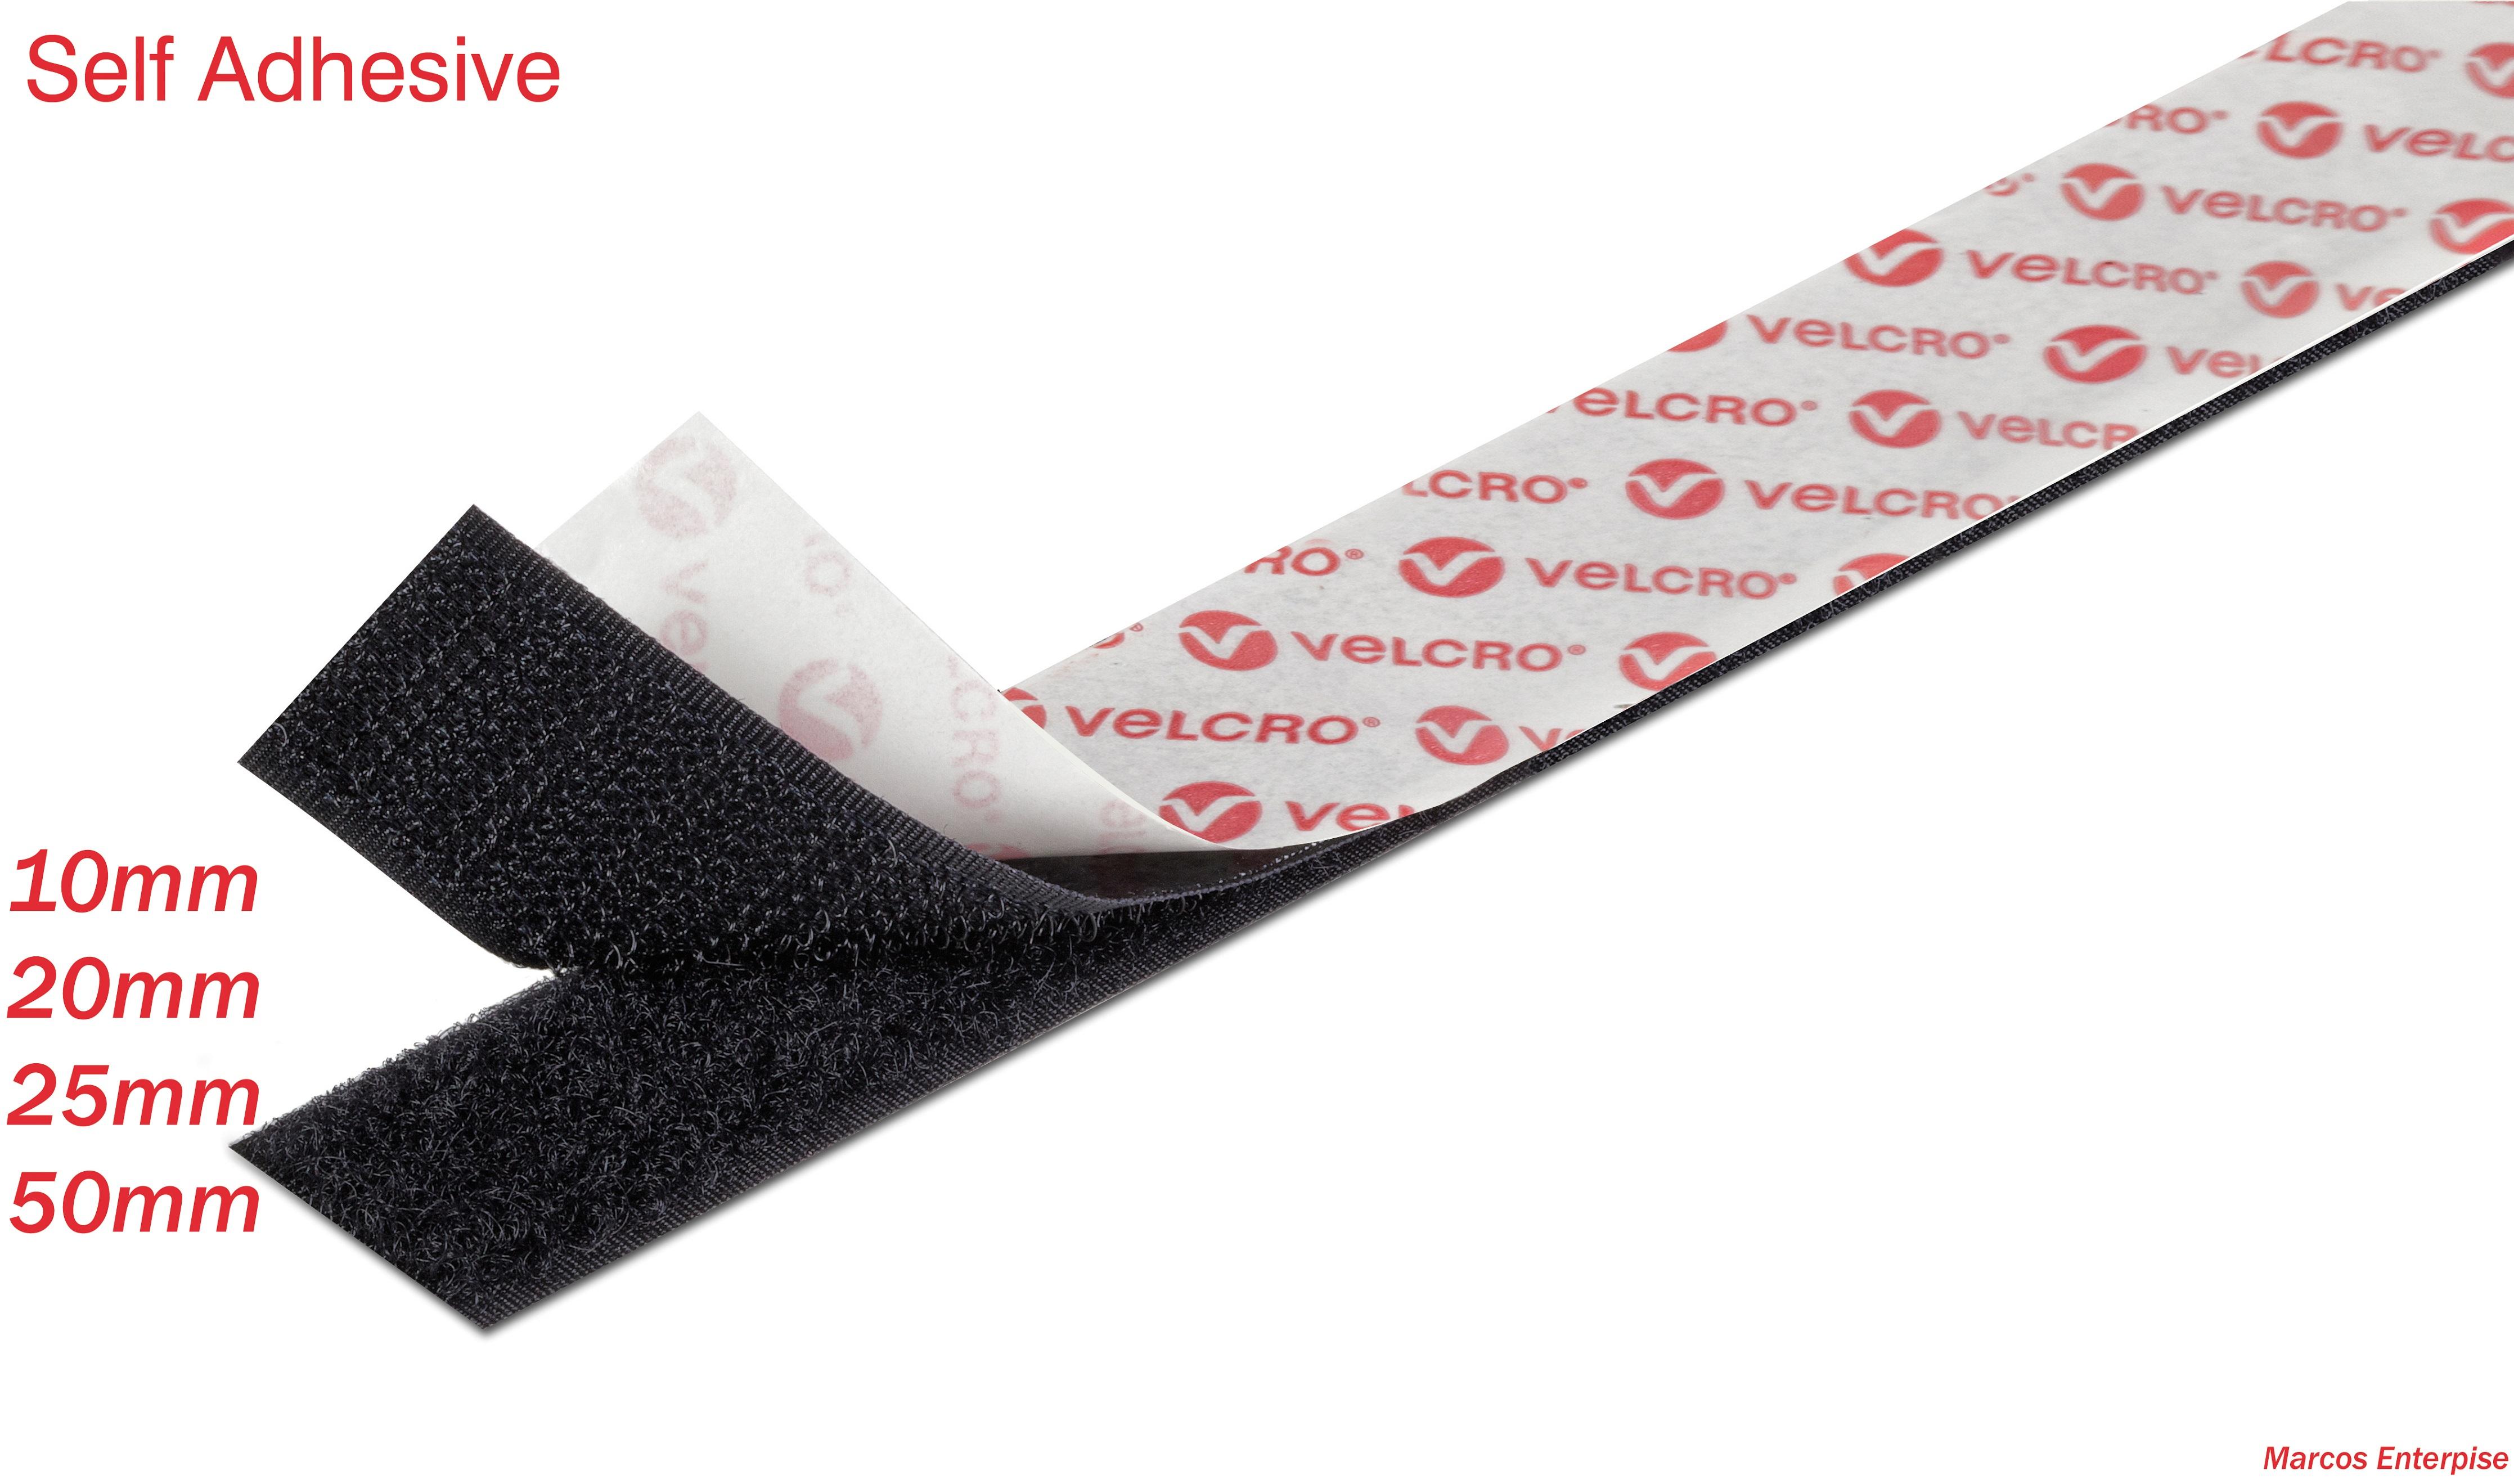 velcro brand self adhesive ps14 hook and loop sticky back tape ebay. Black Bedroom Furniture Sets. Home Design Ideas